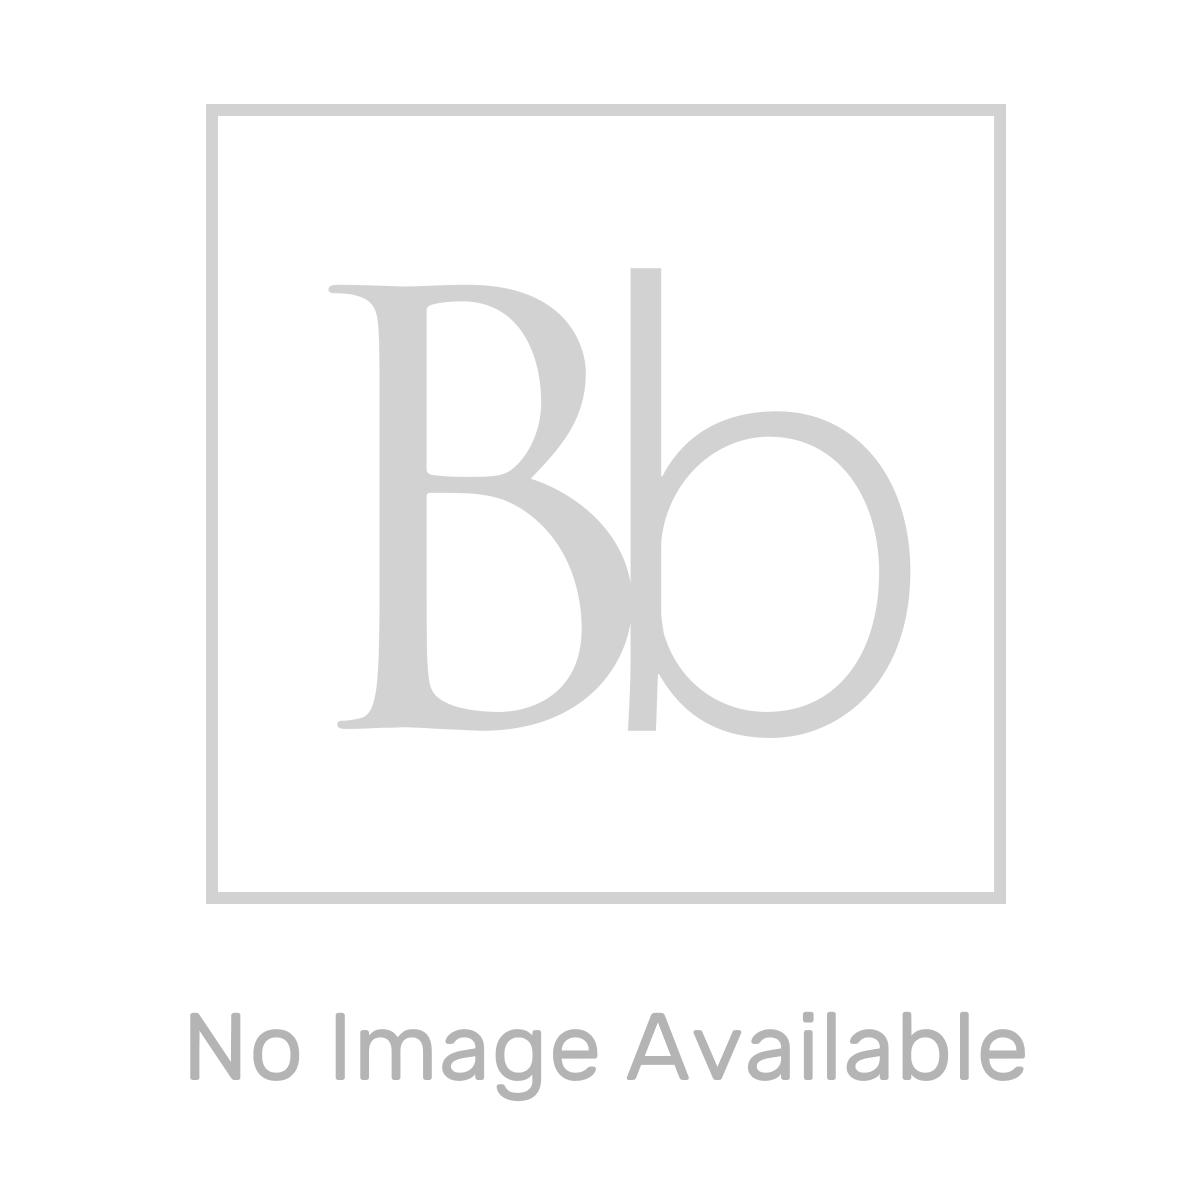 Bathrooms To Love Rectangular Anti-Slip Shower Tray 1000 x 800 Line Drawing